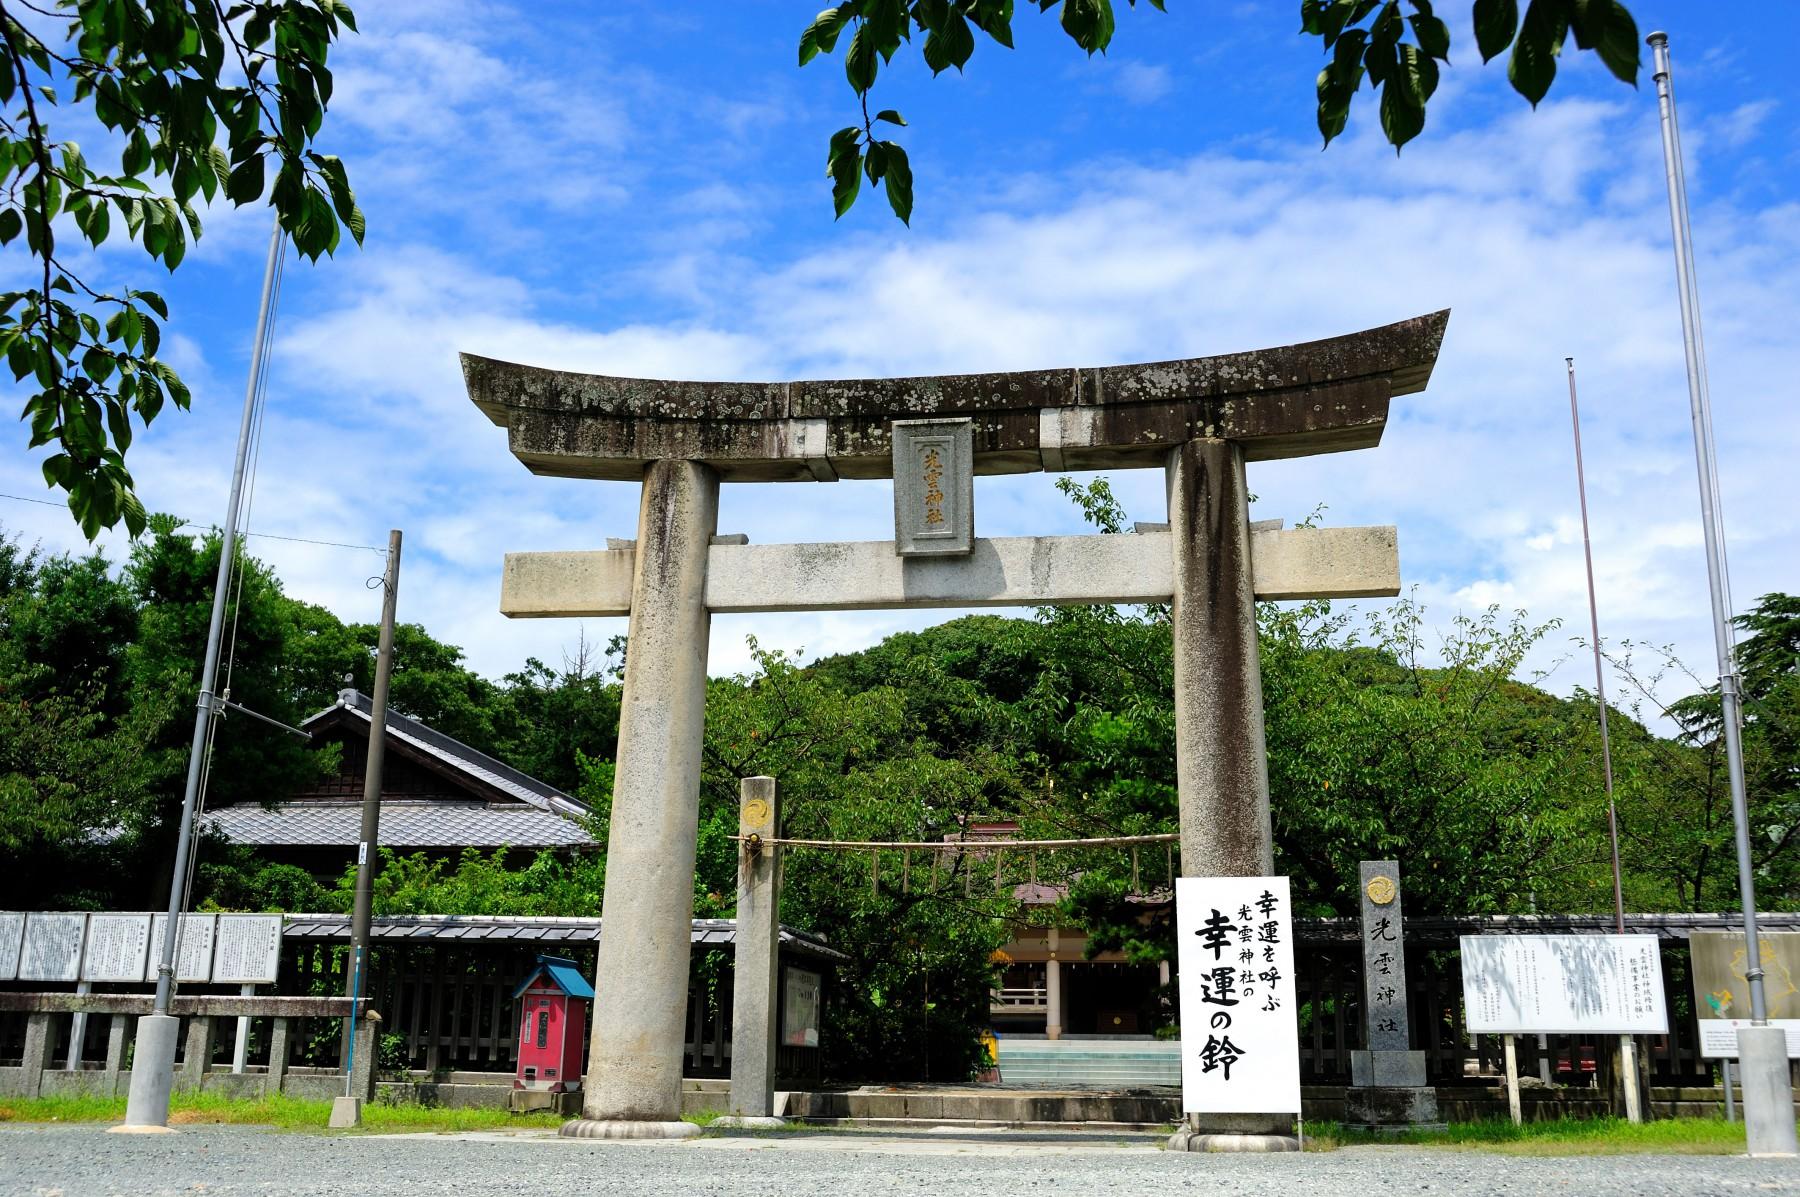 西公園・光雲神社(2009)の画像